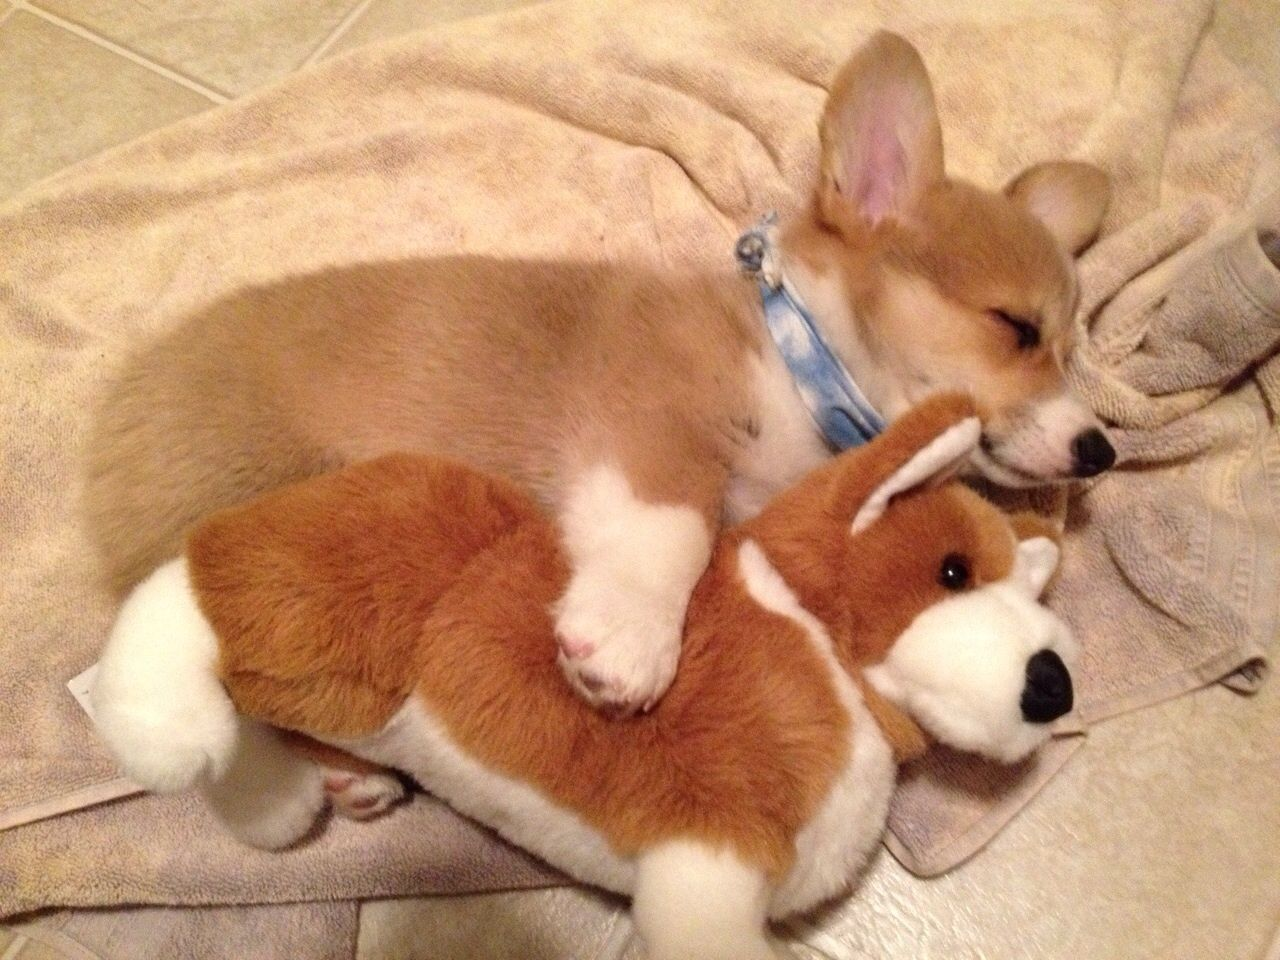 Porgi The Corgi Puppy Asleep With His Friend Corgi